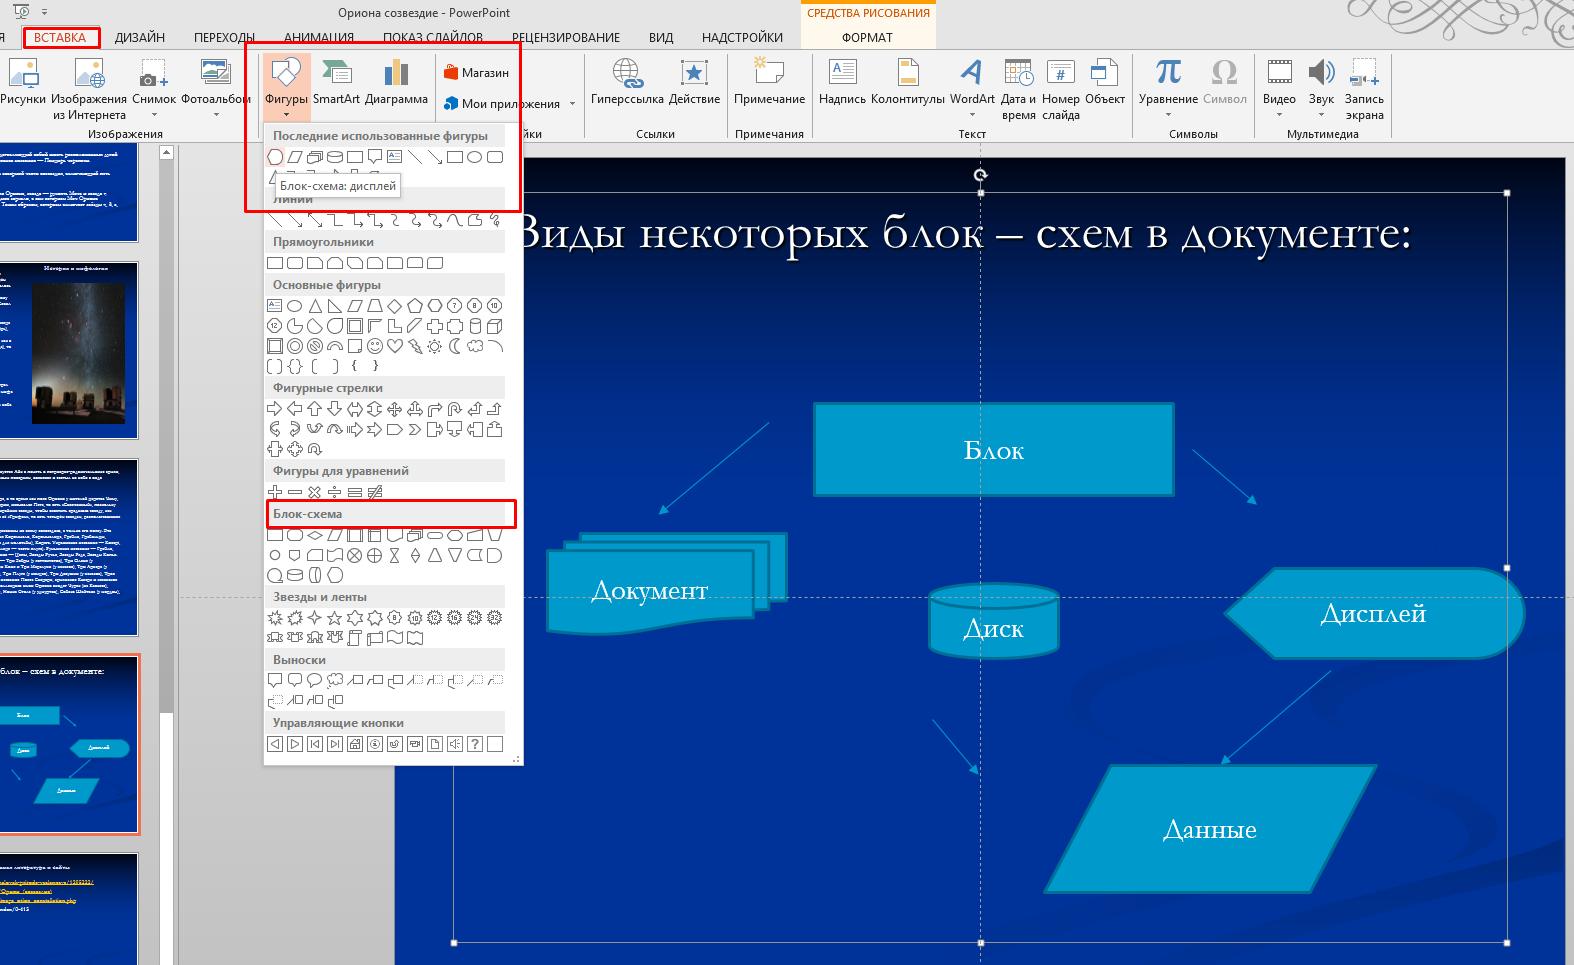 Как добавить слайды для презентации в Power Point?